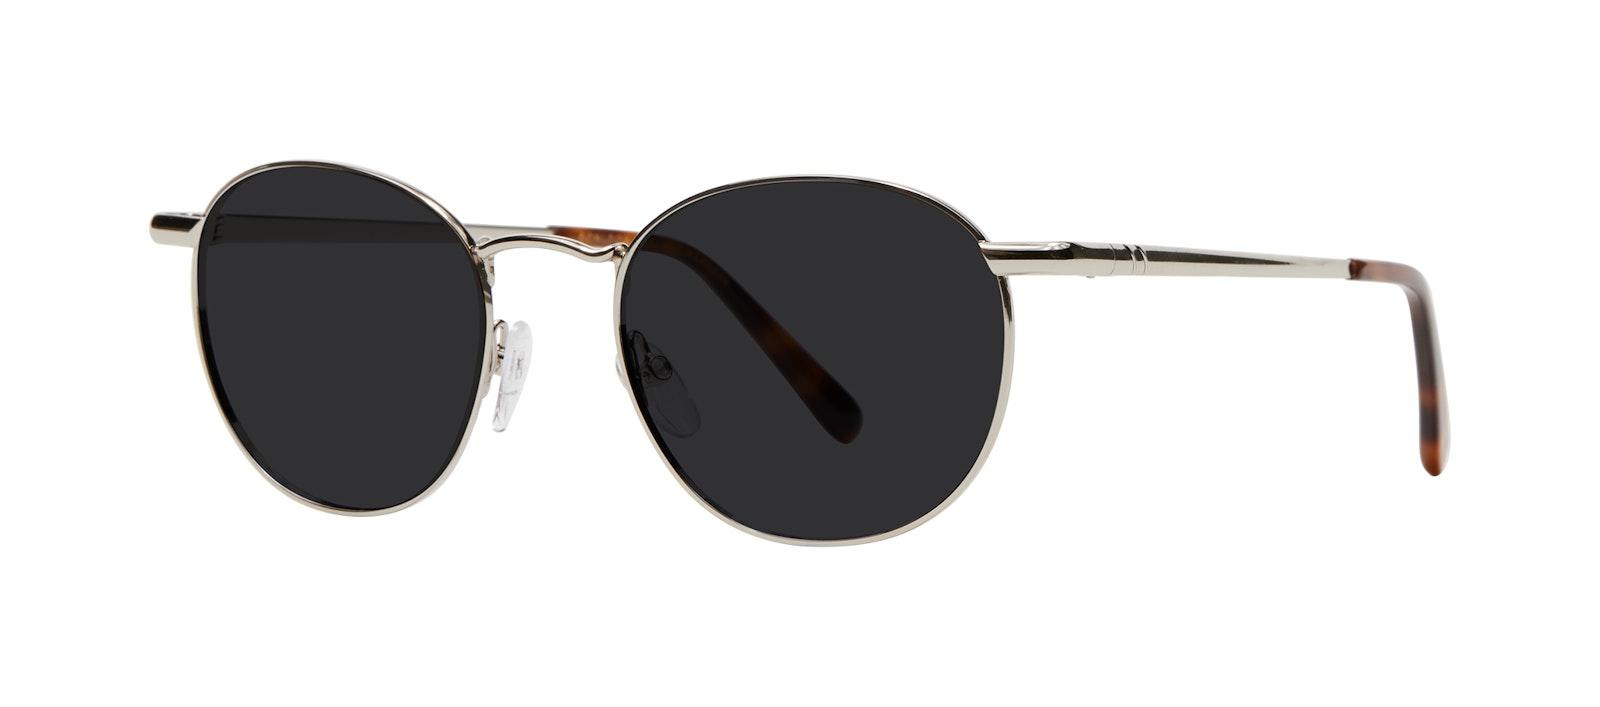 Affordable Fashion Glasses Round Sunglasses Men Women Divine L Silver Tilt